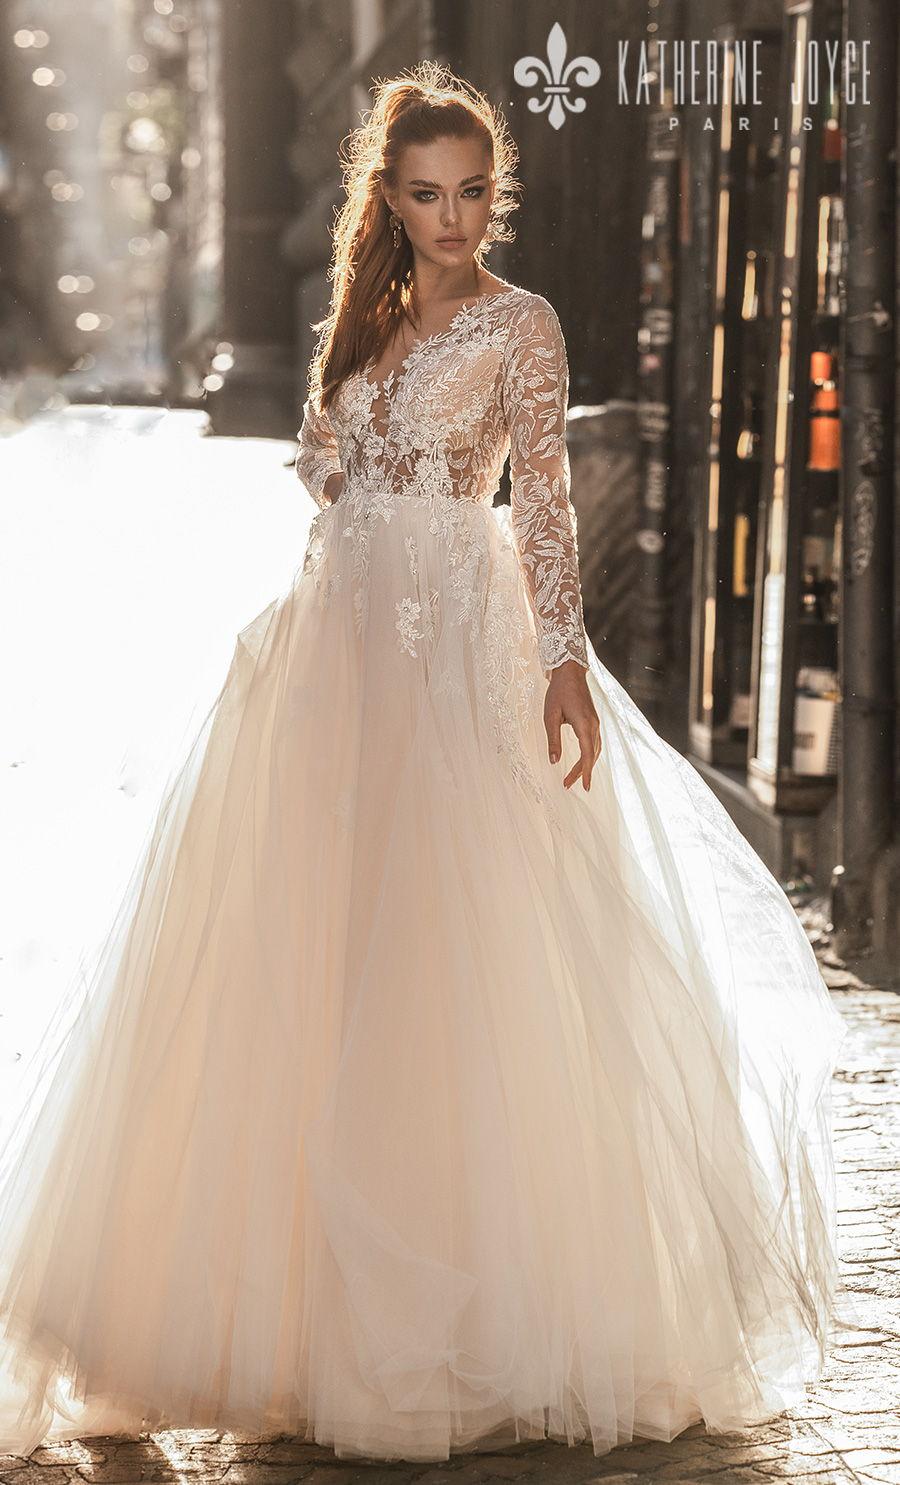 katherine joyce 2021 naples bridal long sleeves v neck heavily embellished bodice romantic a line wedding dress sheer button v back (vesta) mv